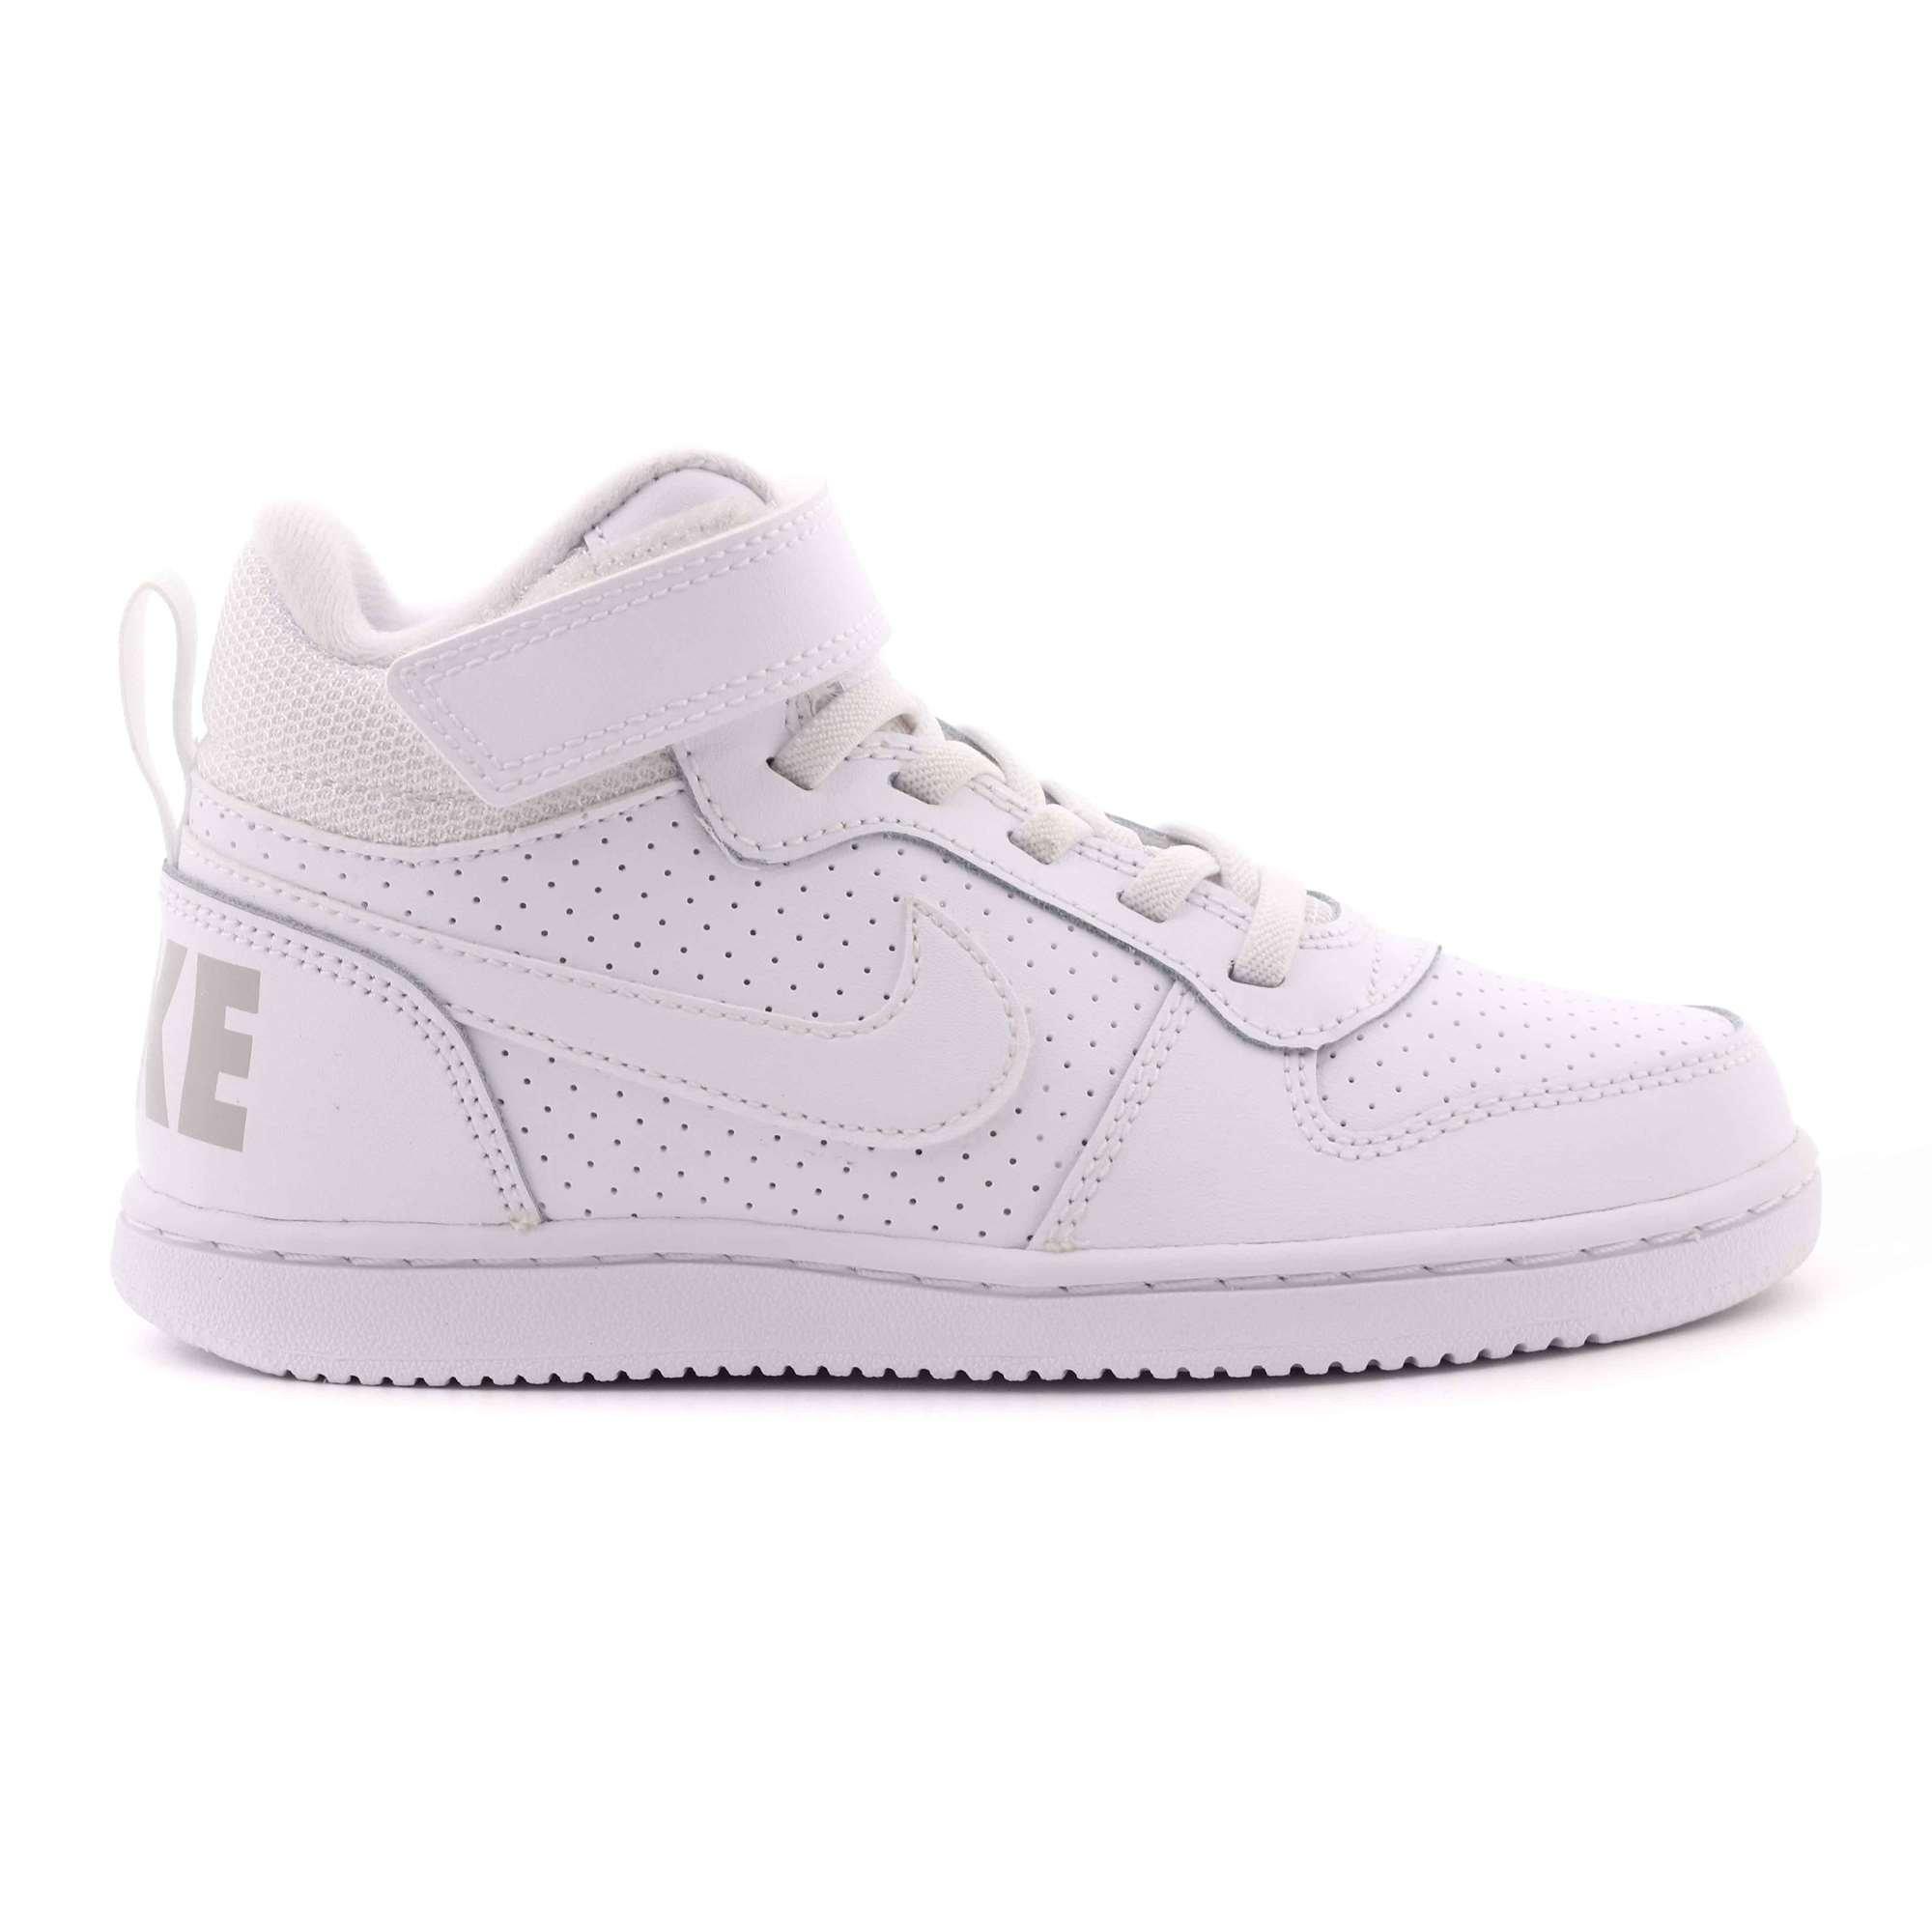 wholesale dealer 55915 d229c Nike Court Borough Mid (PSV), Scarpe da Basket Bambino - Face Shop